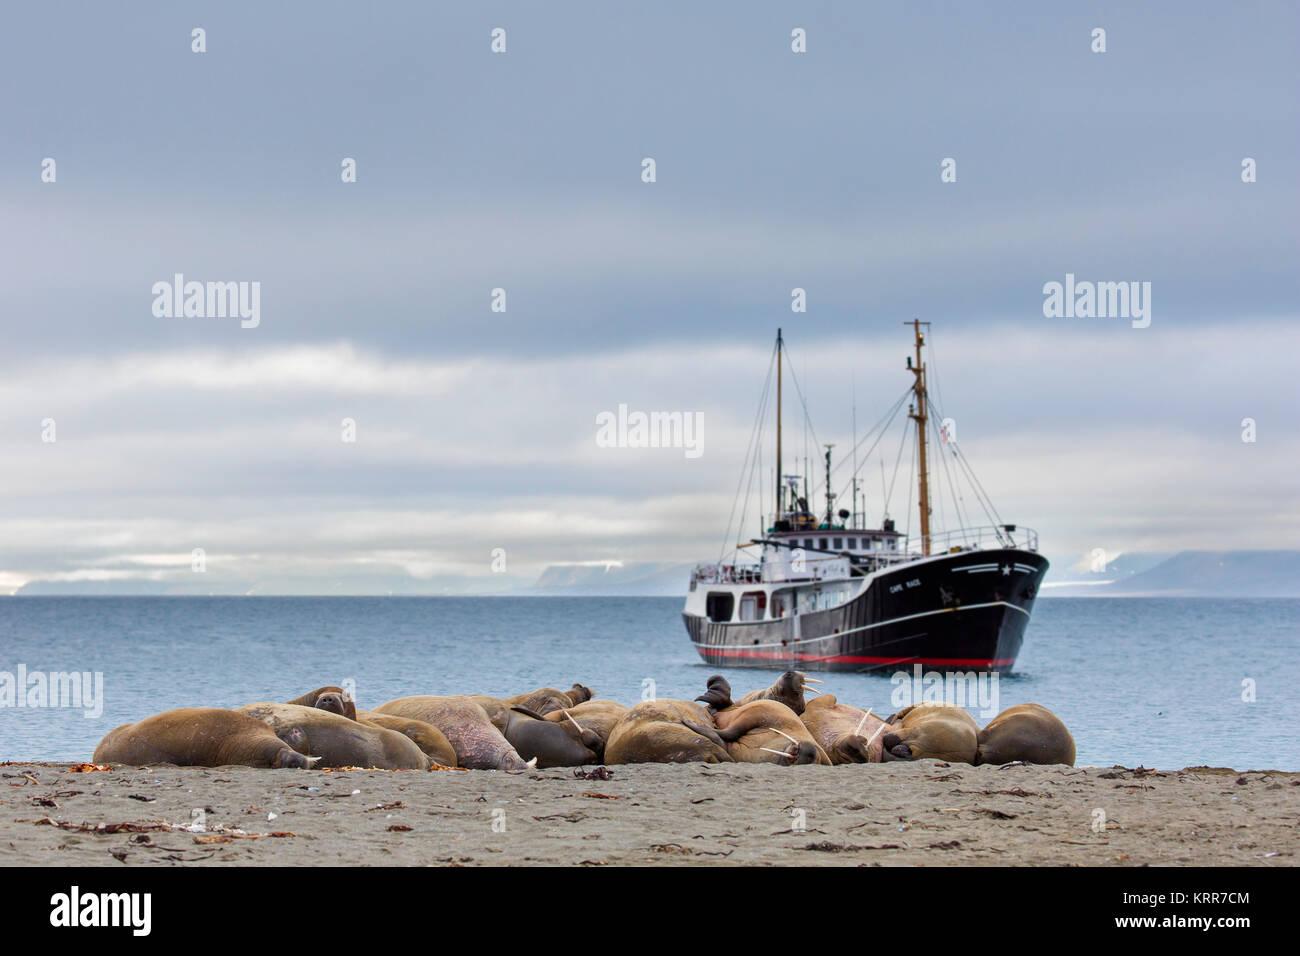 Group of walruses (Odobenus rosmarus) resting on beach at Phippsøya in Sjuøyane, archipelago north of - Stock Image